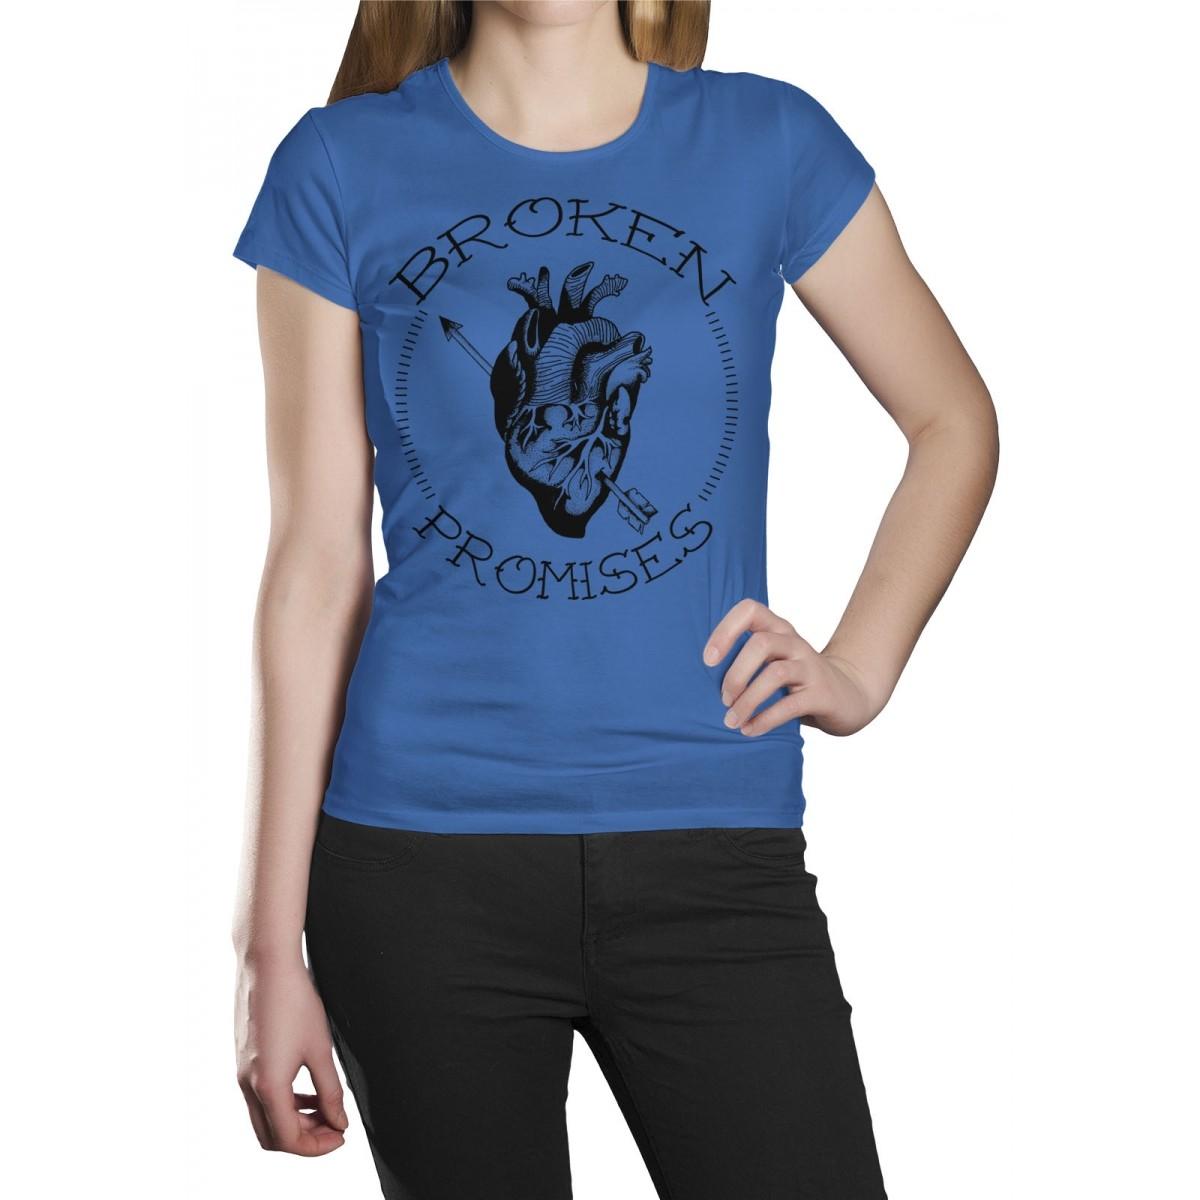 Camiseta HShop Broken Promisses Azul  - HShop